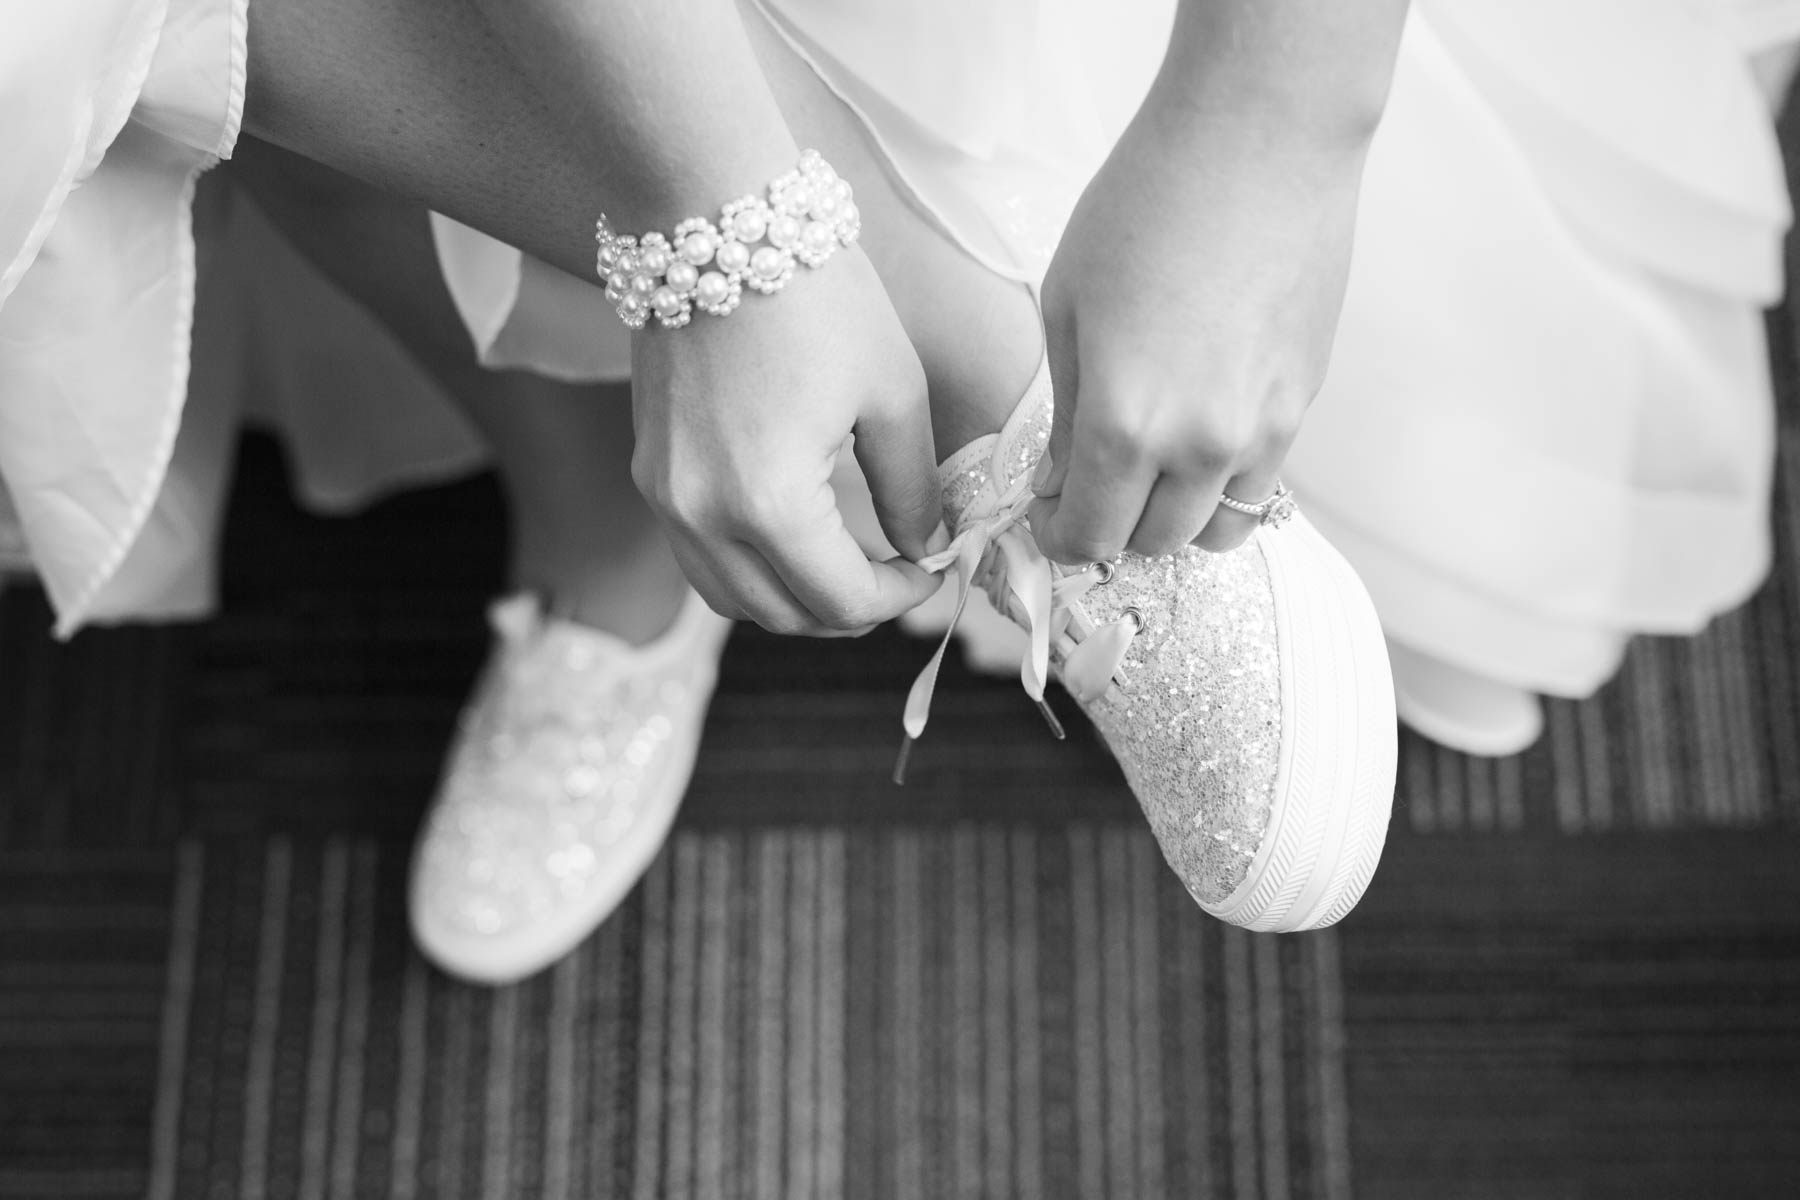 shotbychelsea_blog_wedding-9.jpg